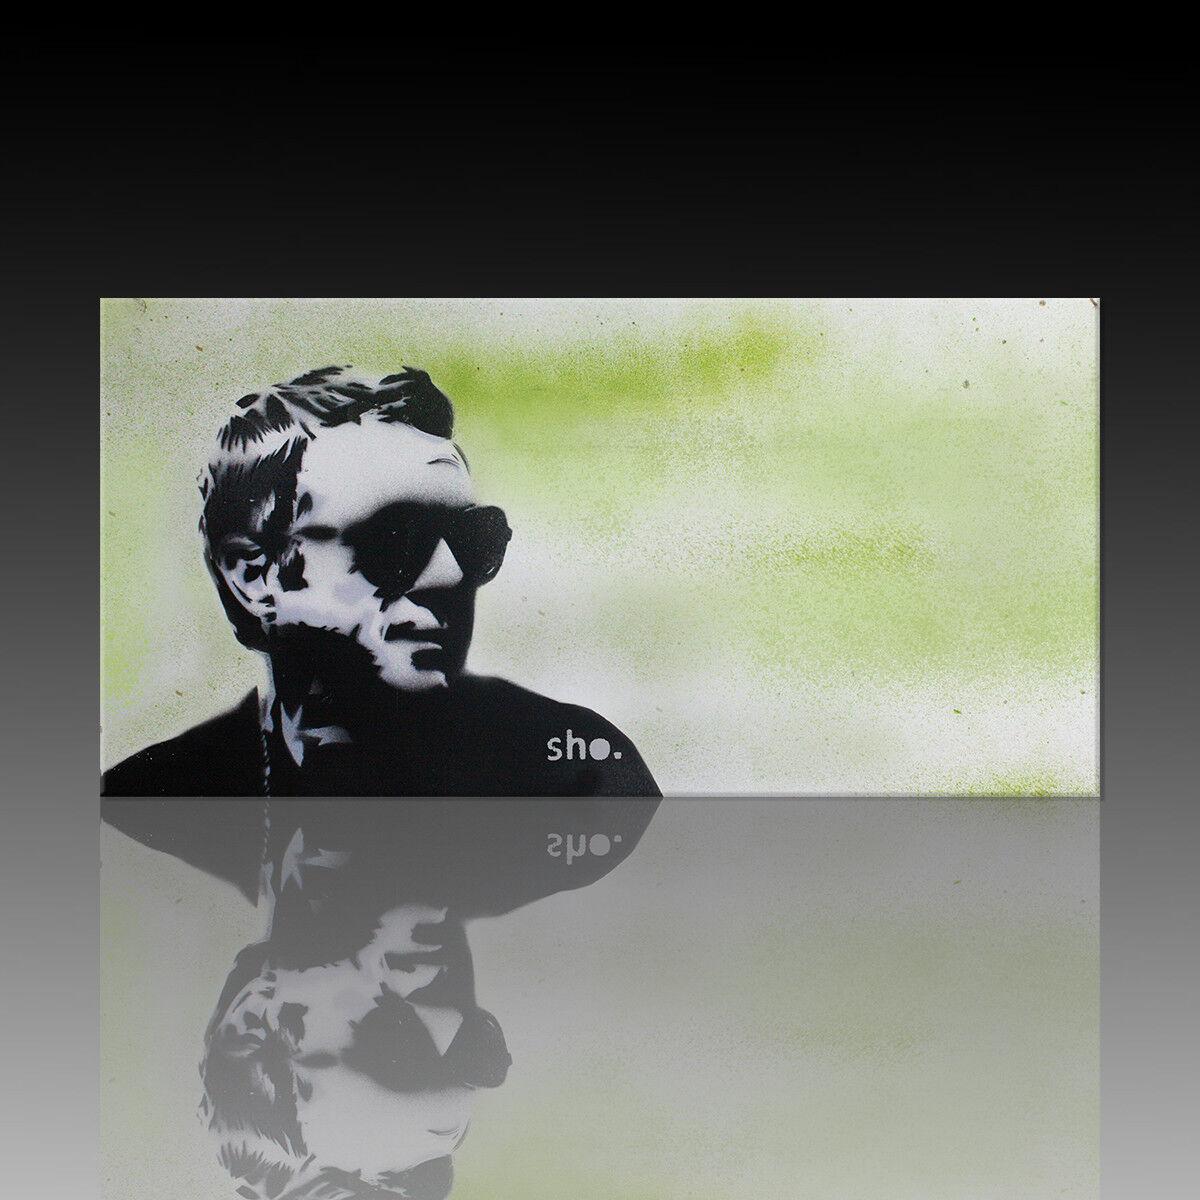 Kunstdruck auf Leinwand-Steve McQueen 3-handmade by SHO (div. Größen) Street Art